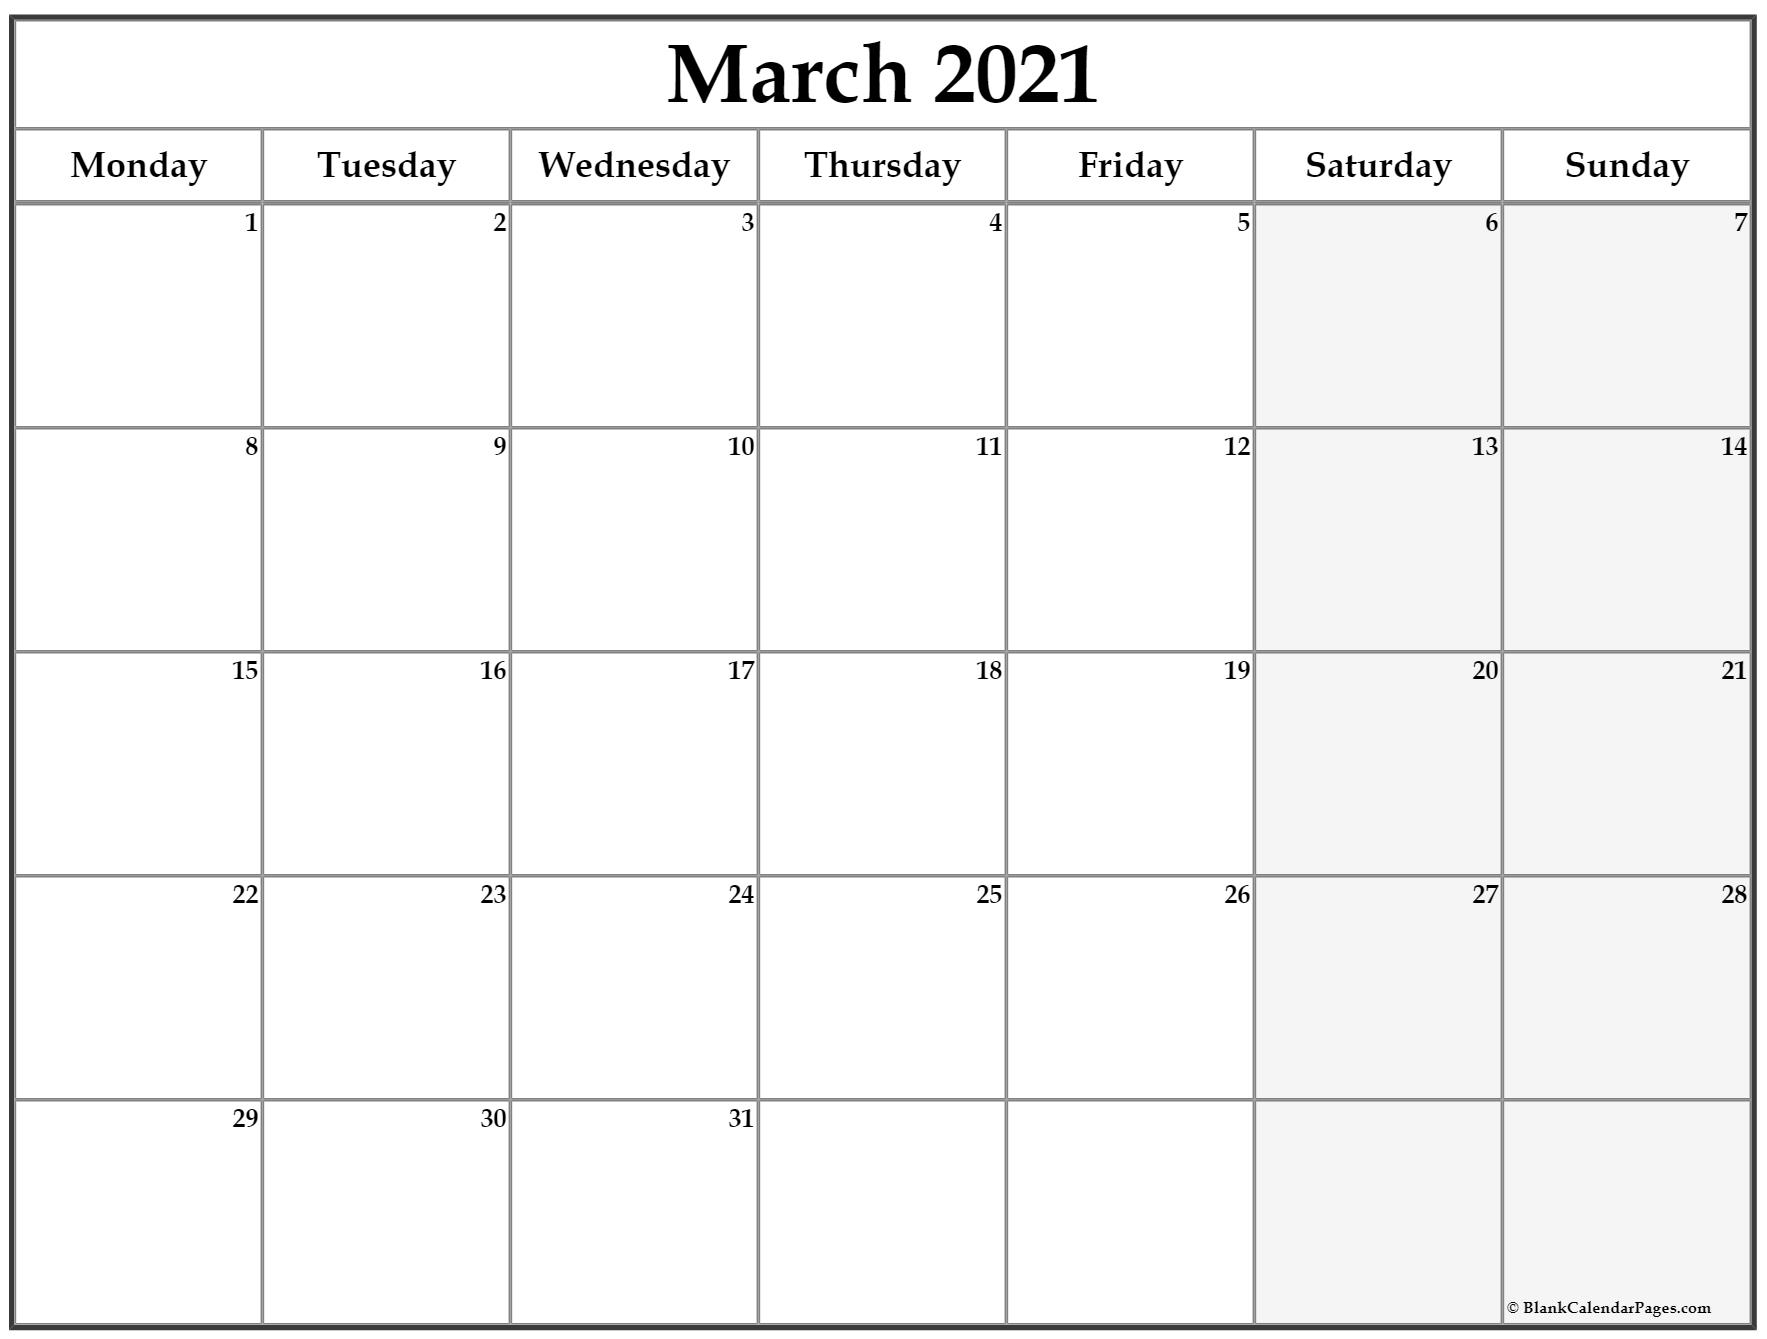 March 2021 Monday Calendar | Monday To Sunday